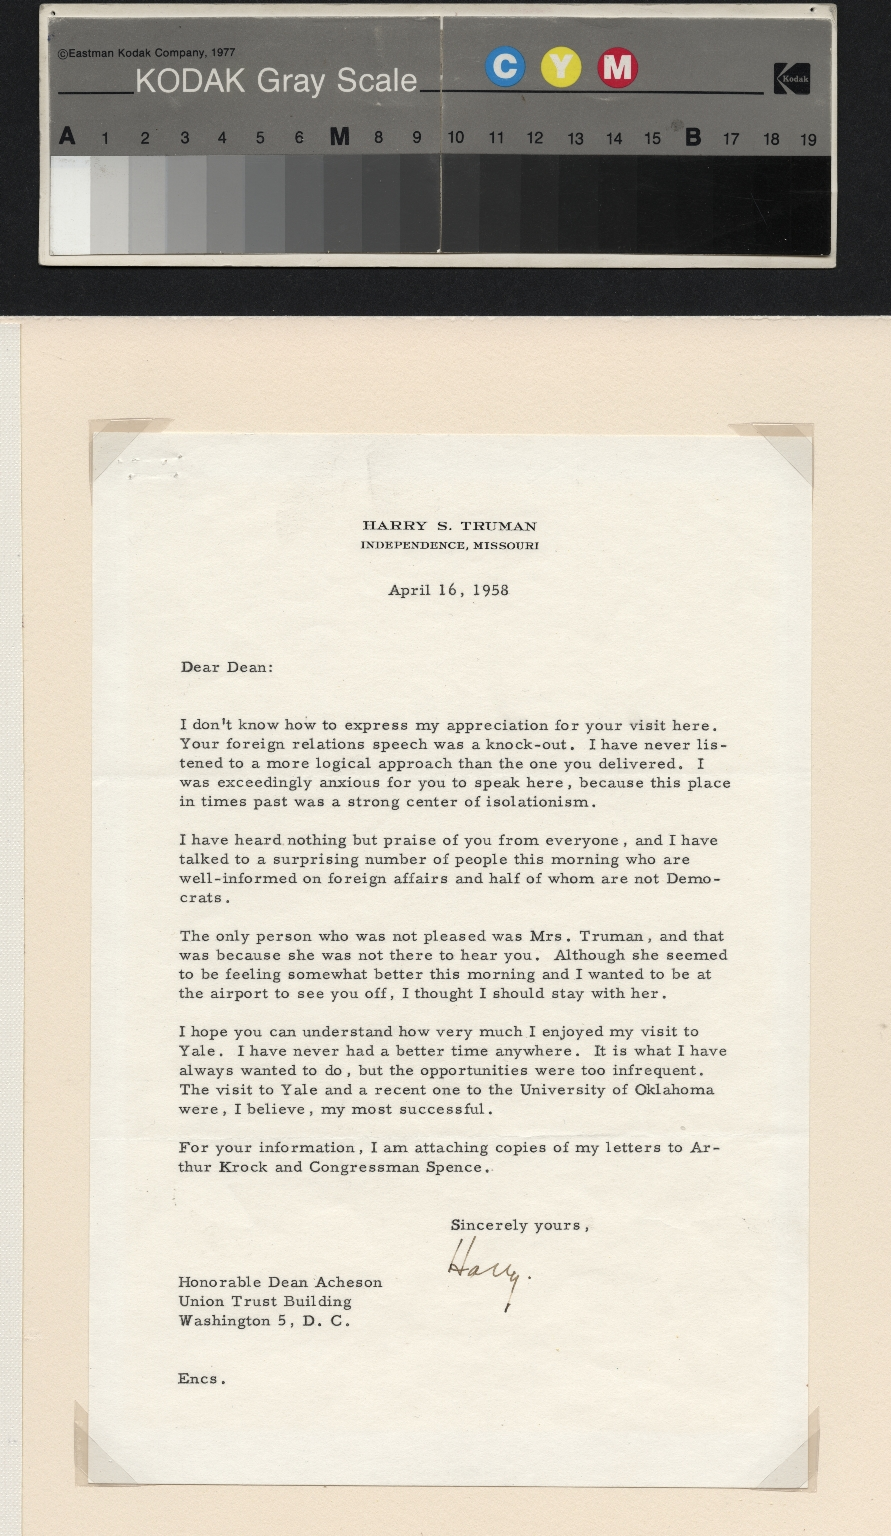 Truman letter to Dean Acheson